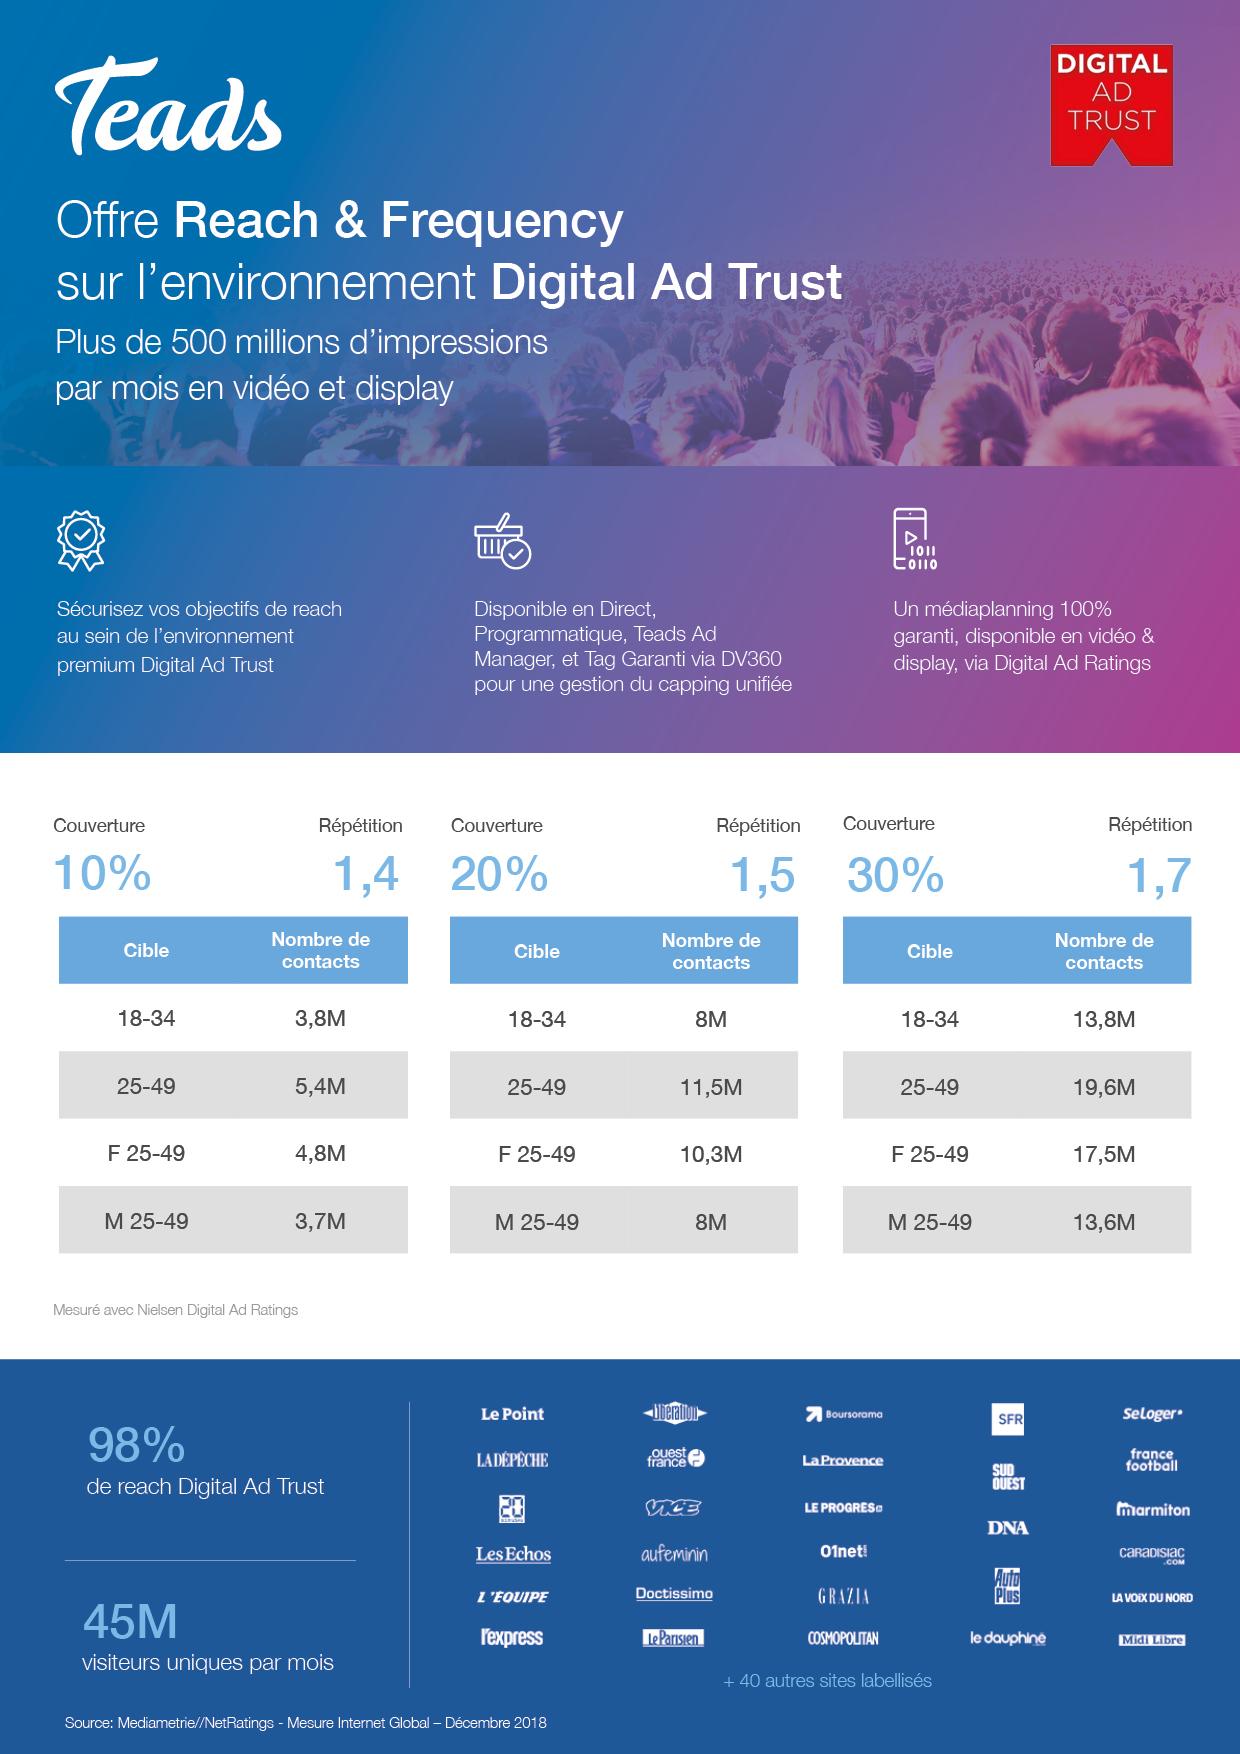 Teads_Reach-Frequency-Digital-Ad-Trust